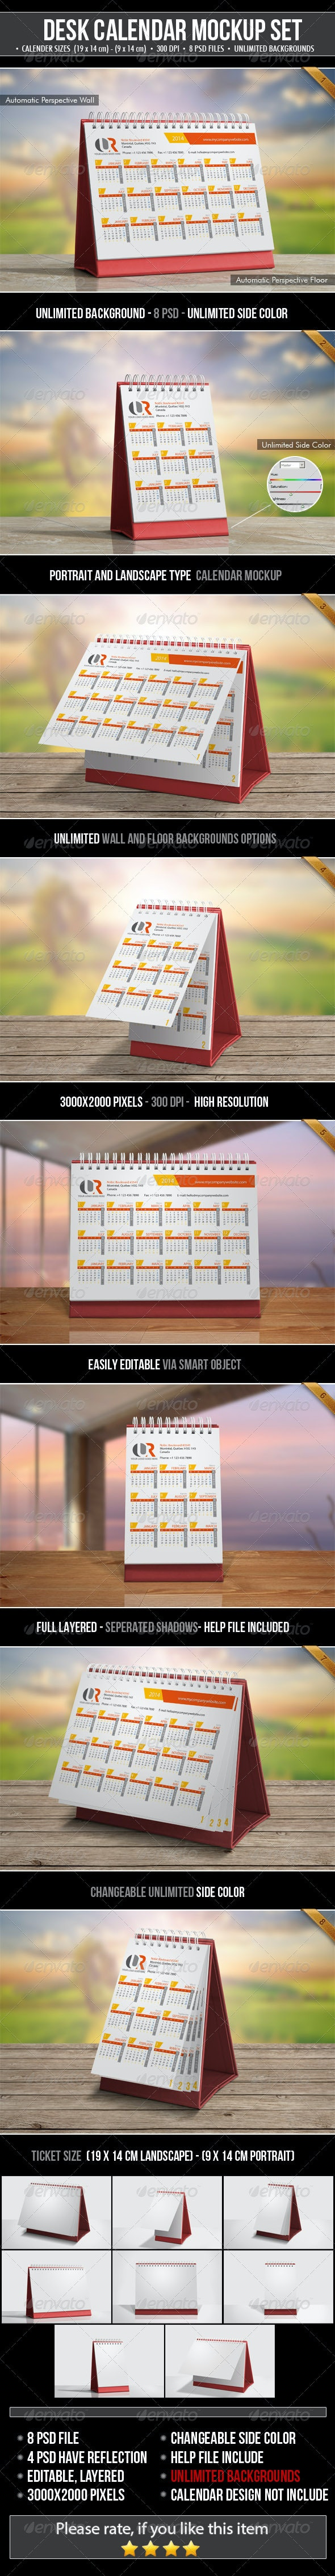 Desk Calendar Mockup Set - Miscellaneous Print